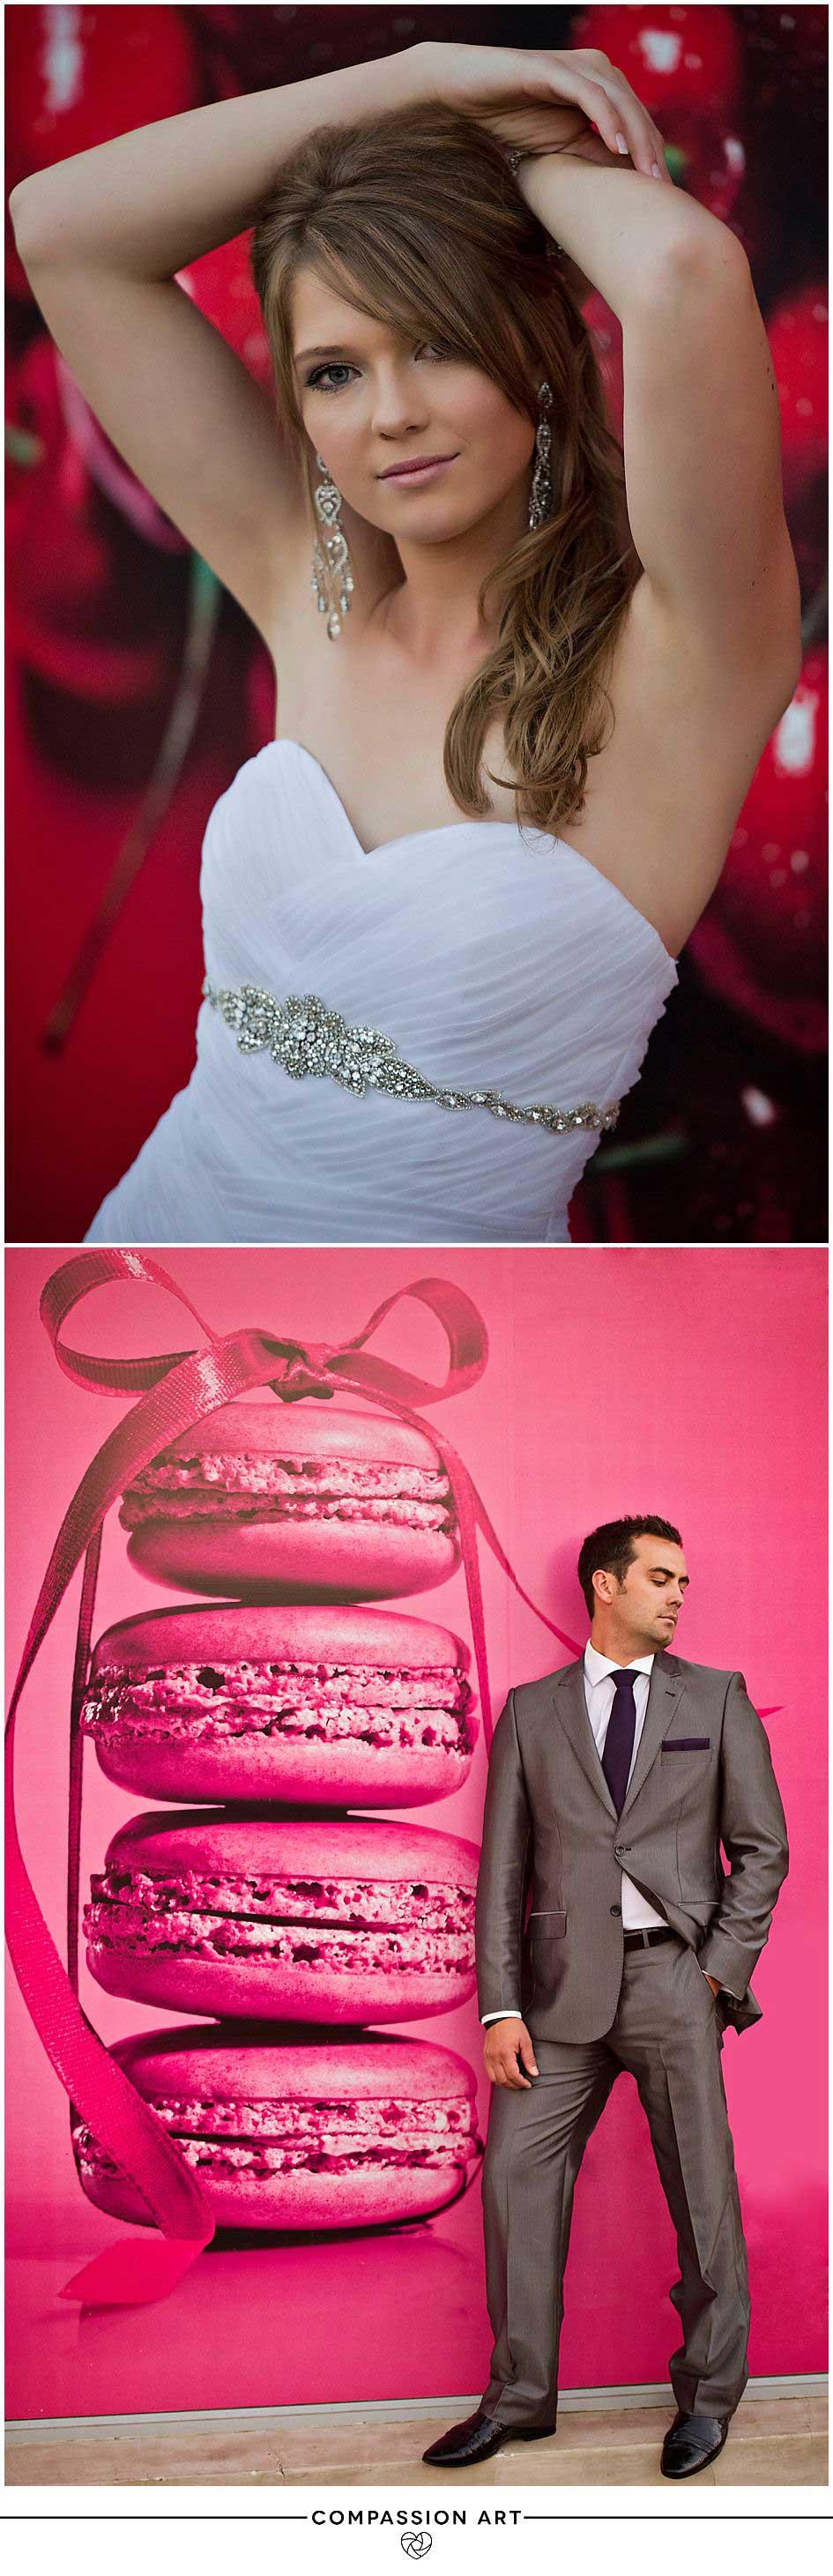 melrose-arch-wedding-shoot.jpg